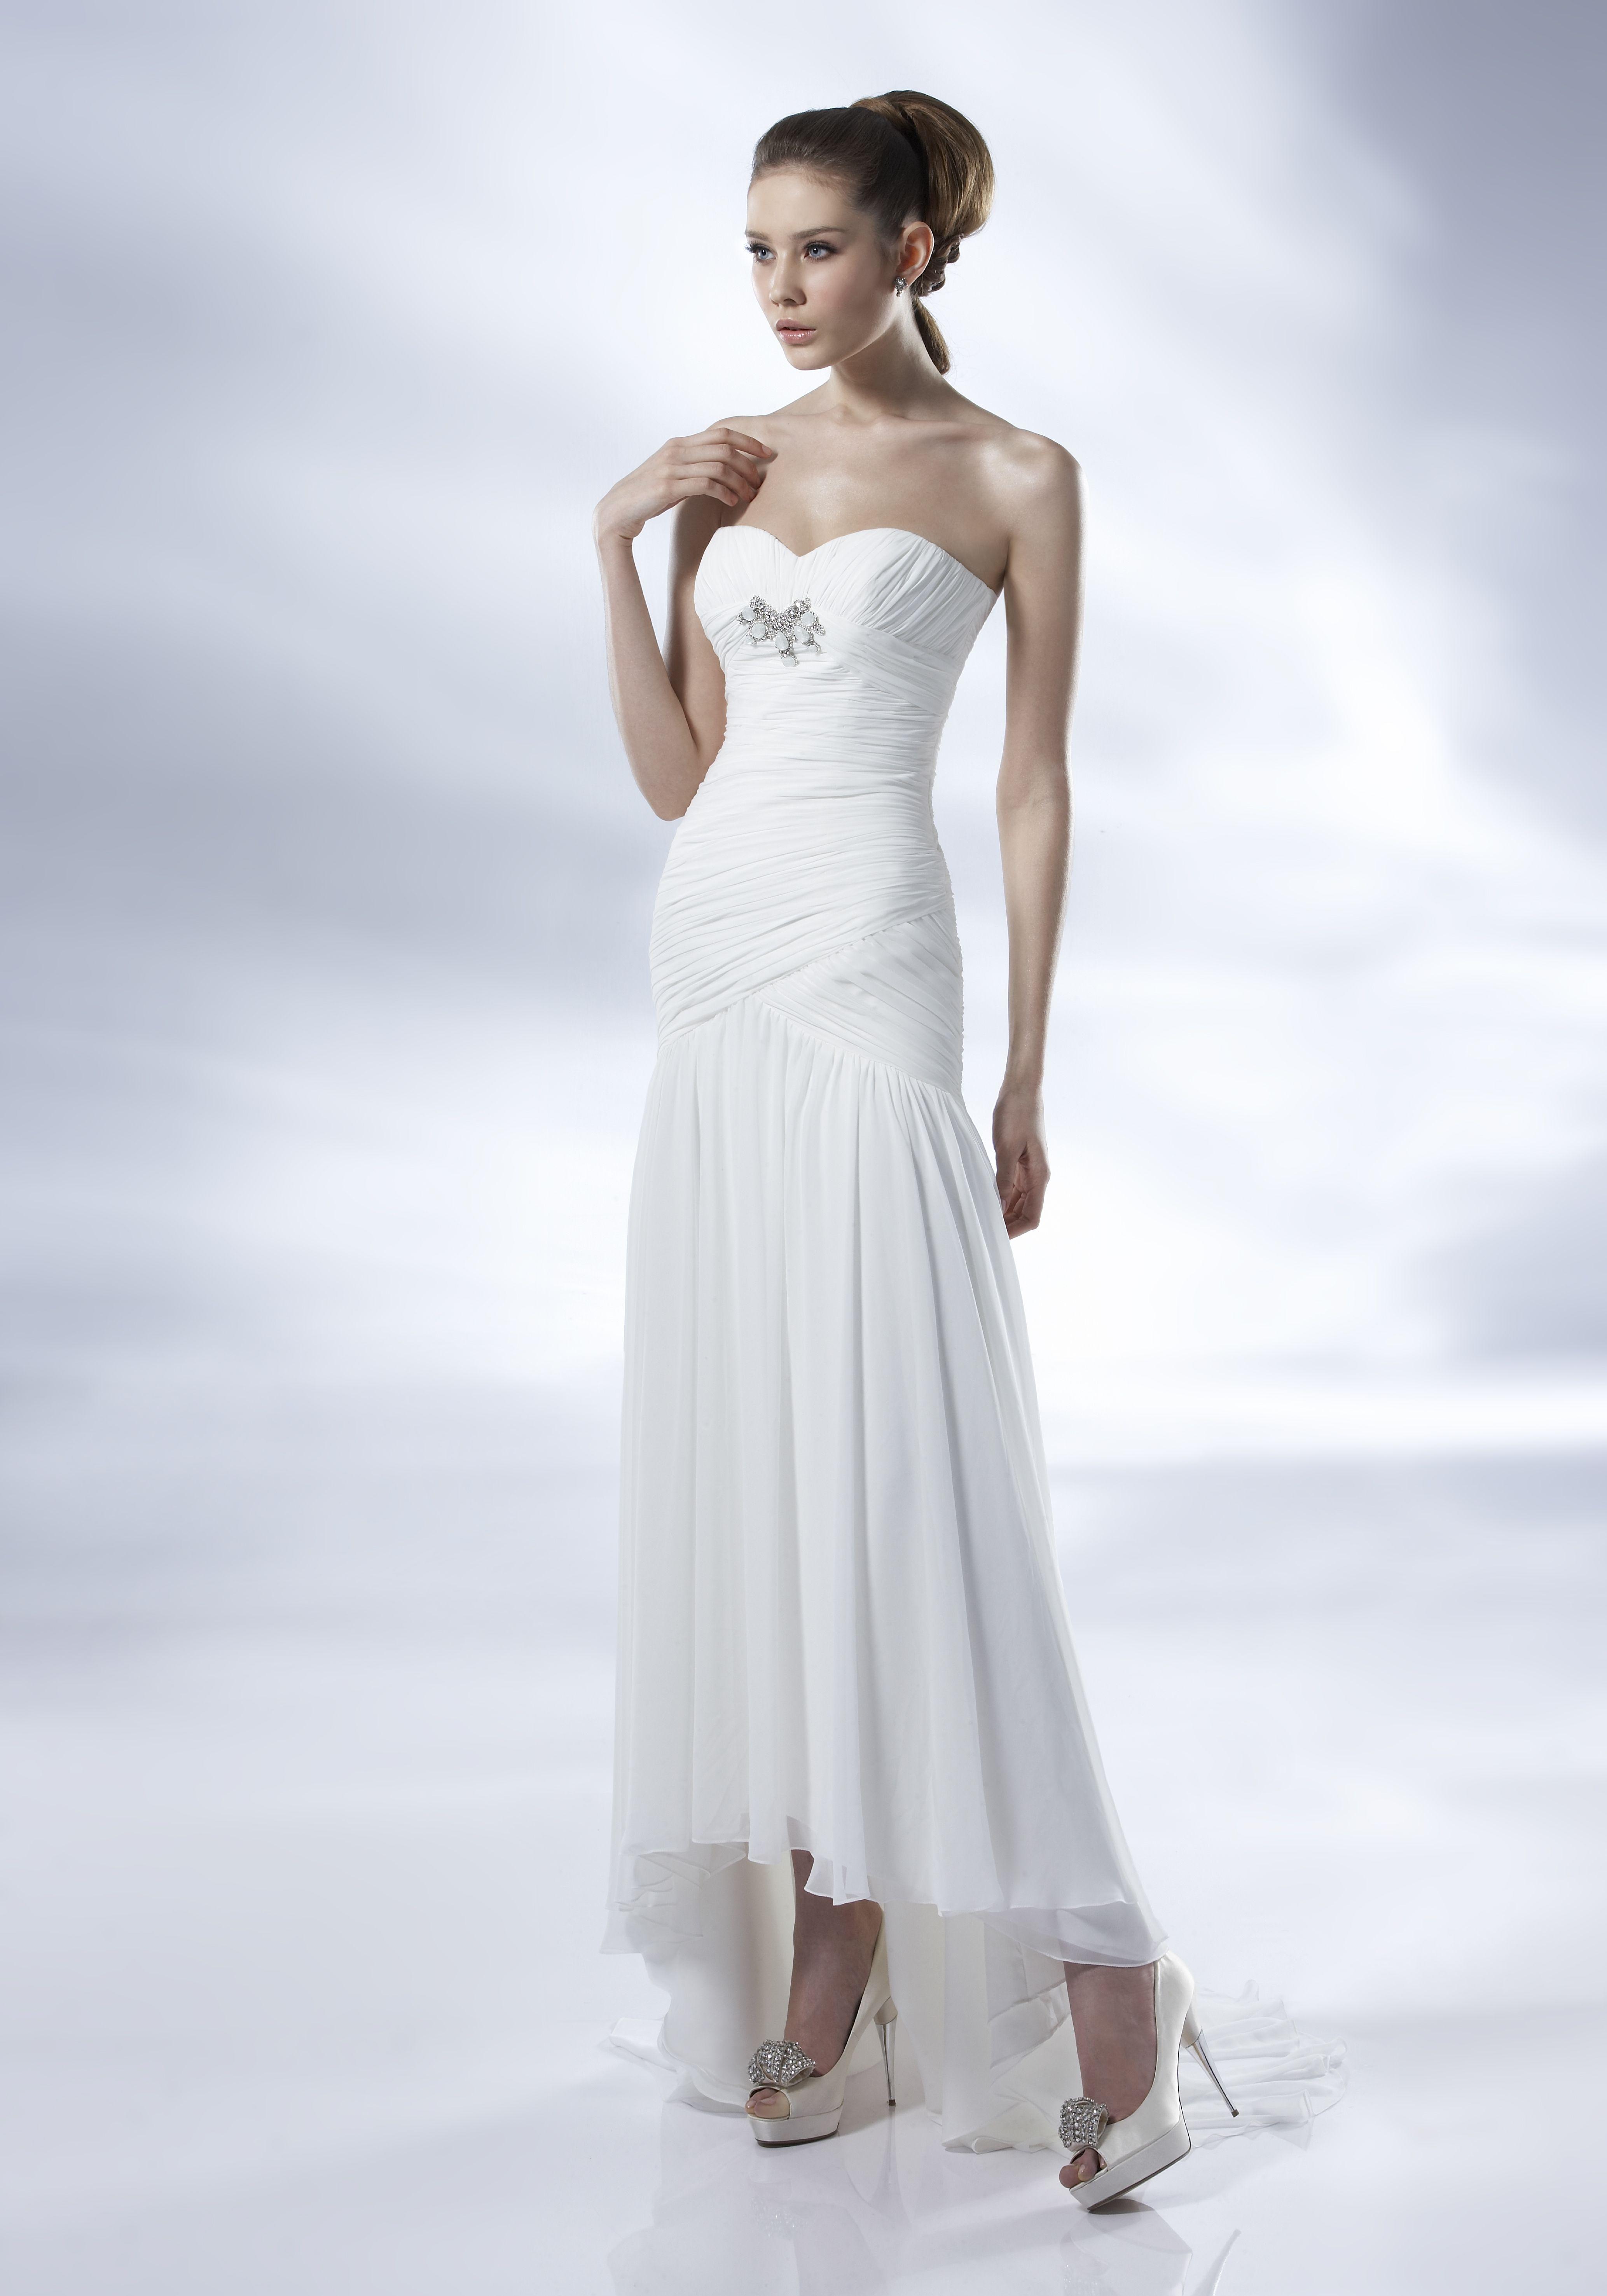 Erfreut Low Budget Wedding Dresses Fotos - Brautkleider Ideen ...